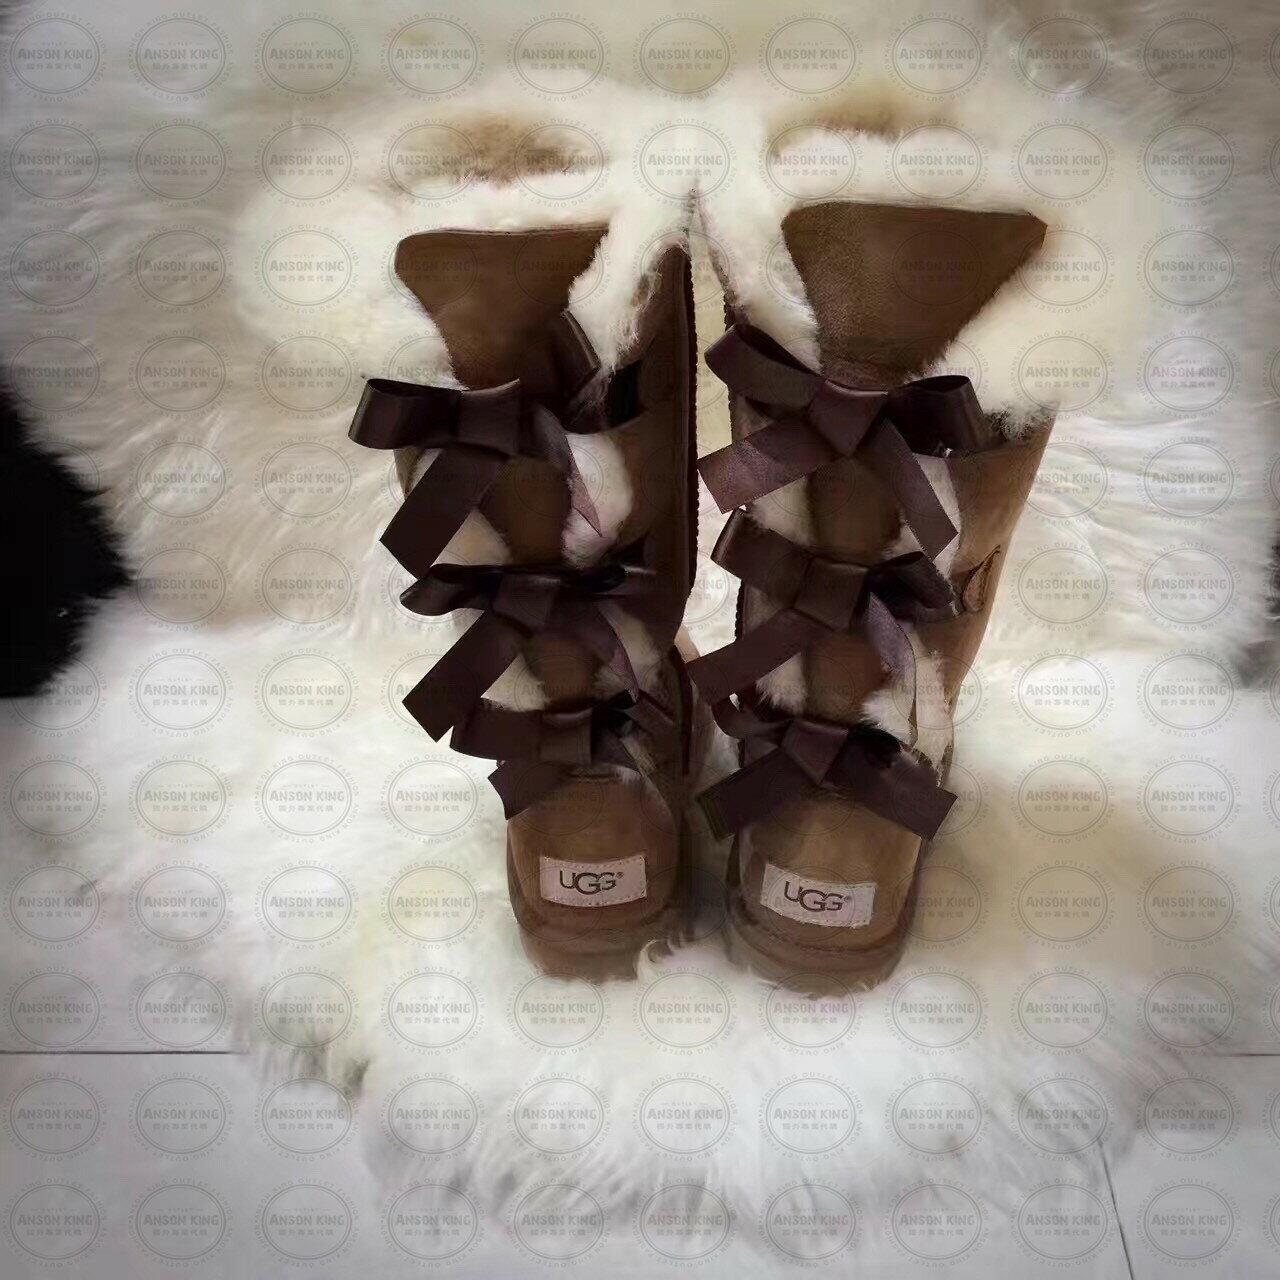 OUTLET正品代購 澳洲 UGG 一體女式絲帶蝴蝶結 保暖 真皮羊皮毛 雪靴 短靴 棕色 3